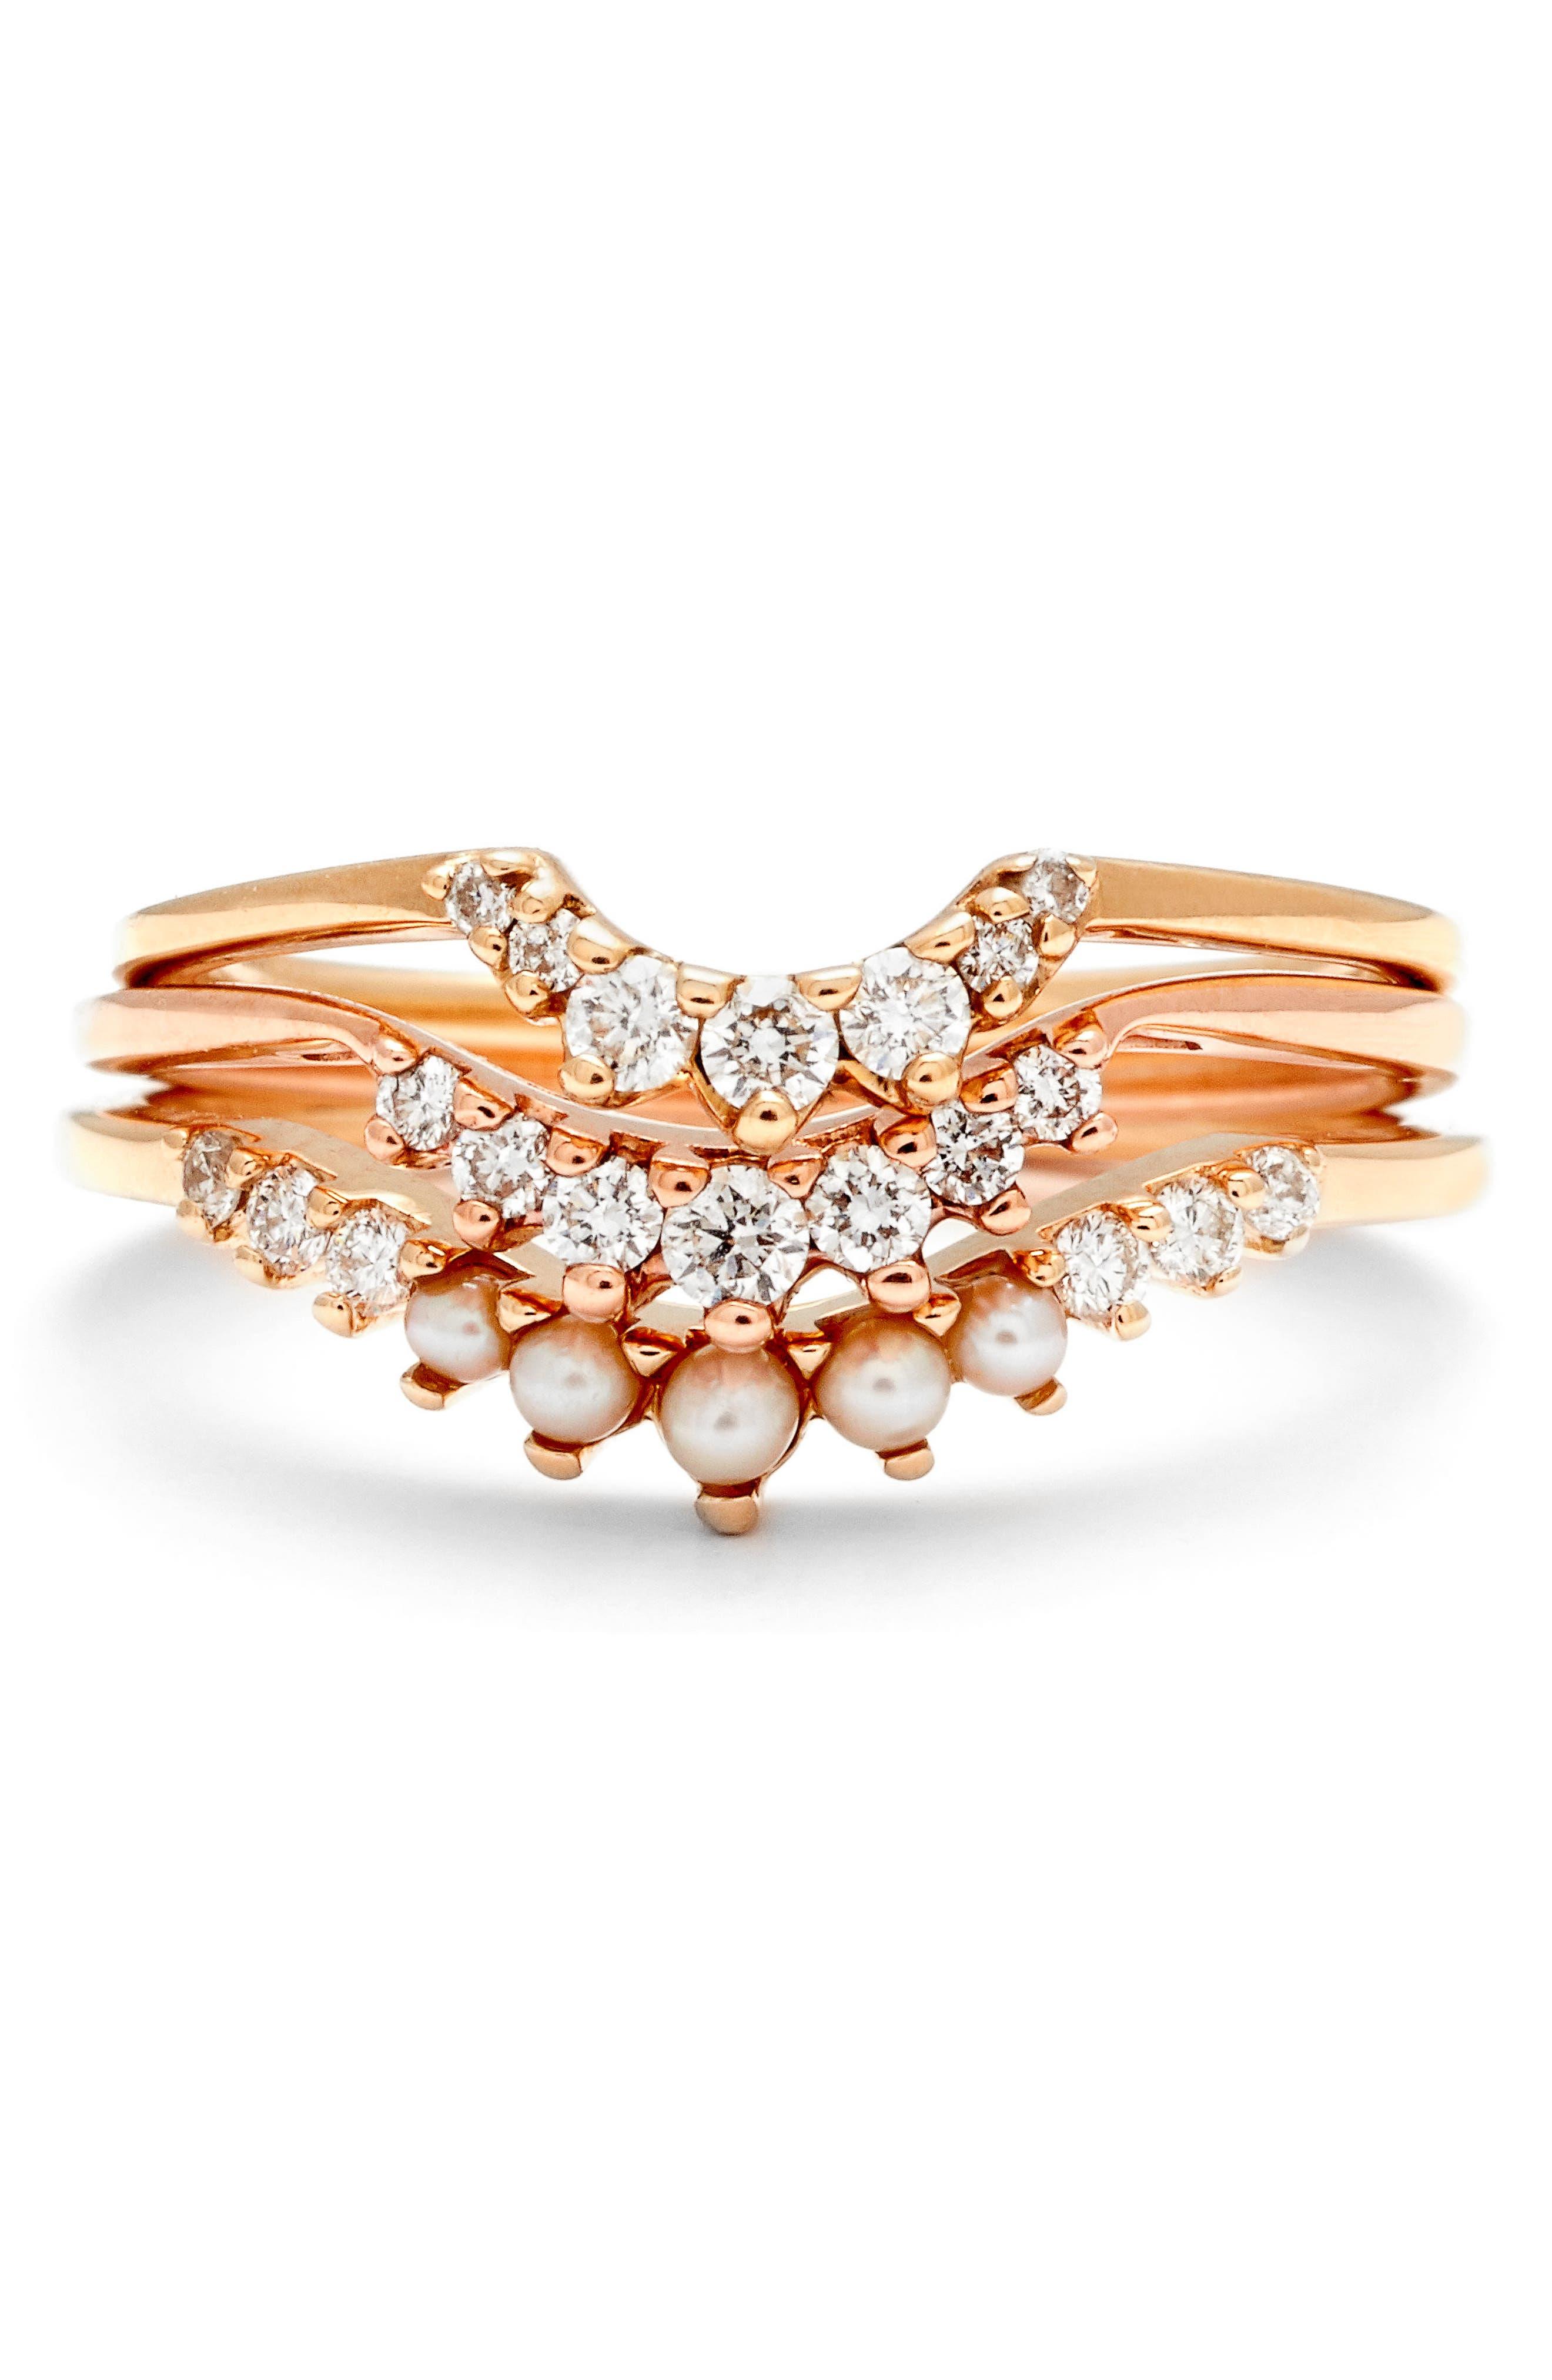 'Luna Tiara' Diamond Ring,                             Alternate thumbnail 2, color,                             ROSE/ GOLD/ WHITE